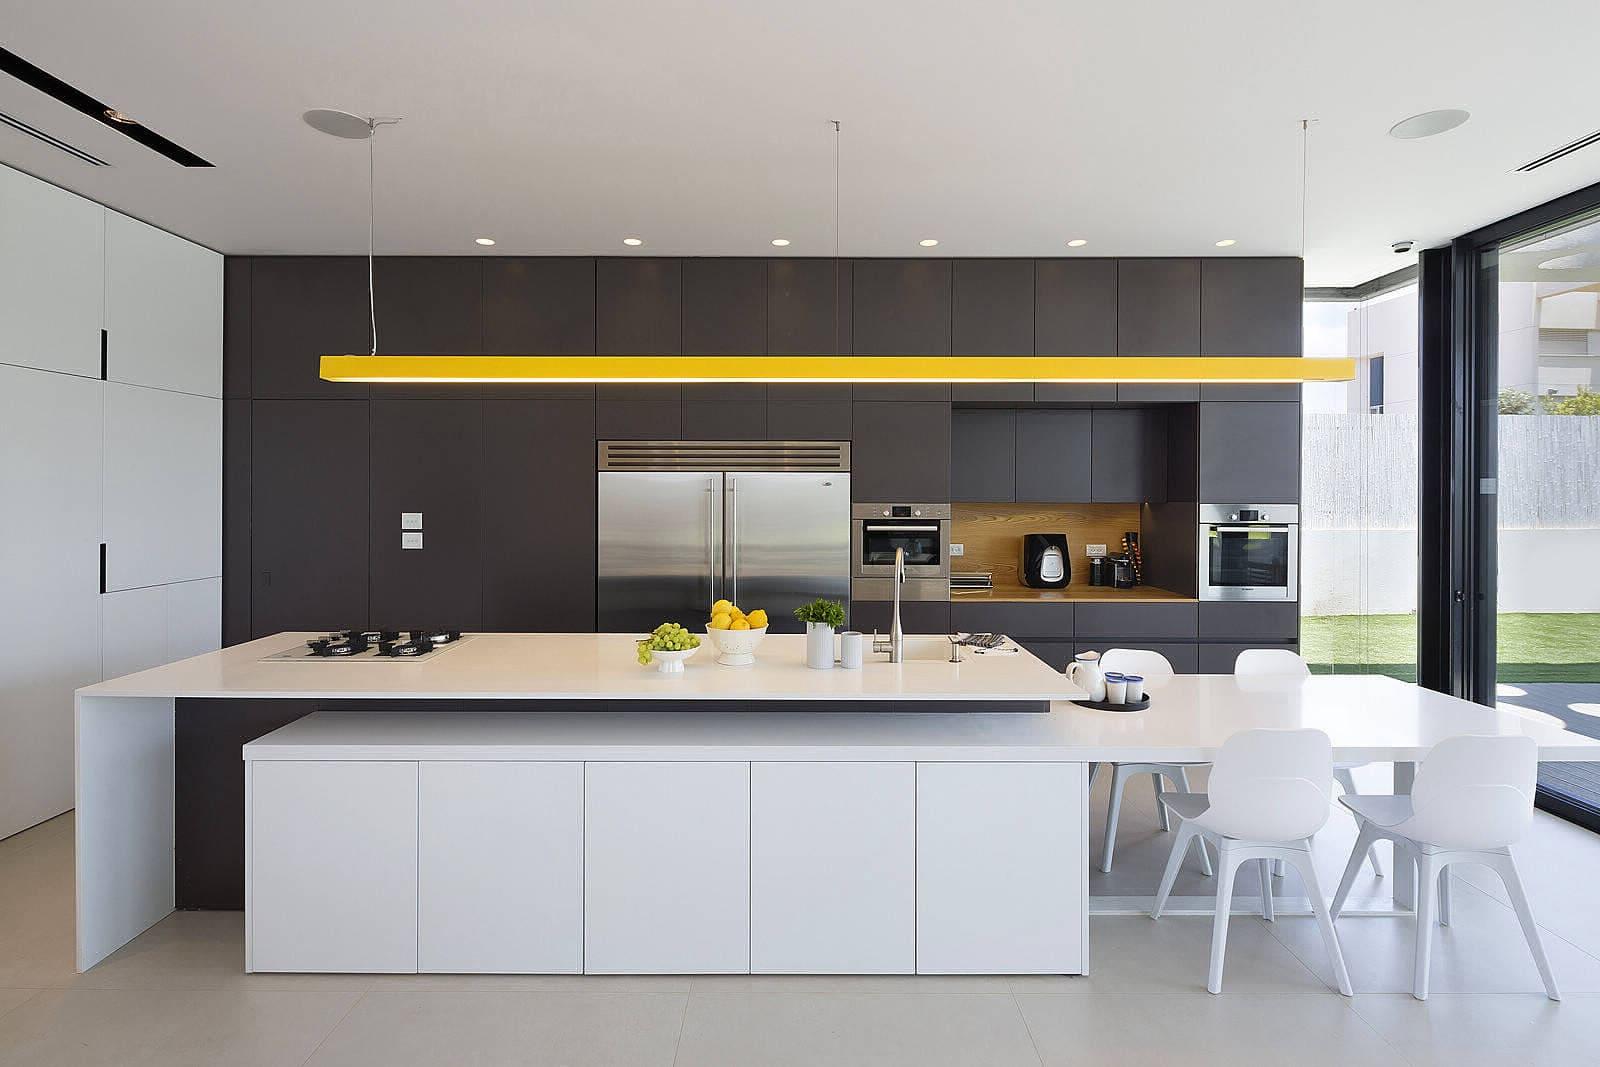 Цвета для кухни в стиле минимализм